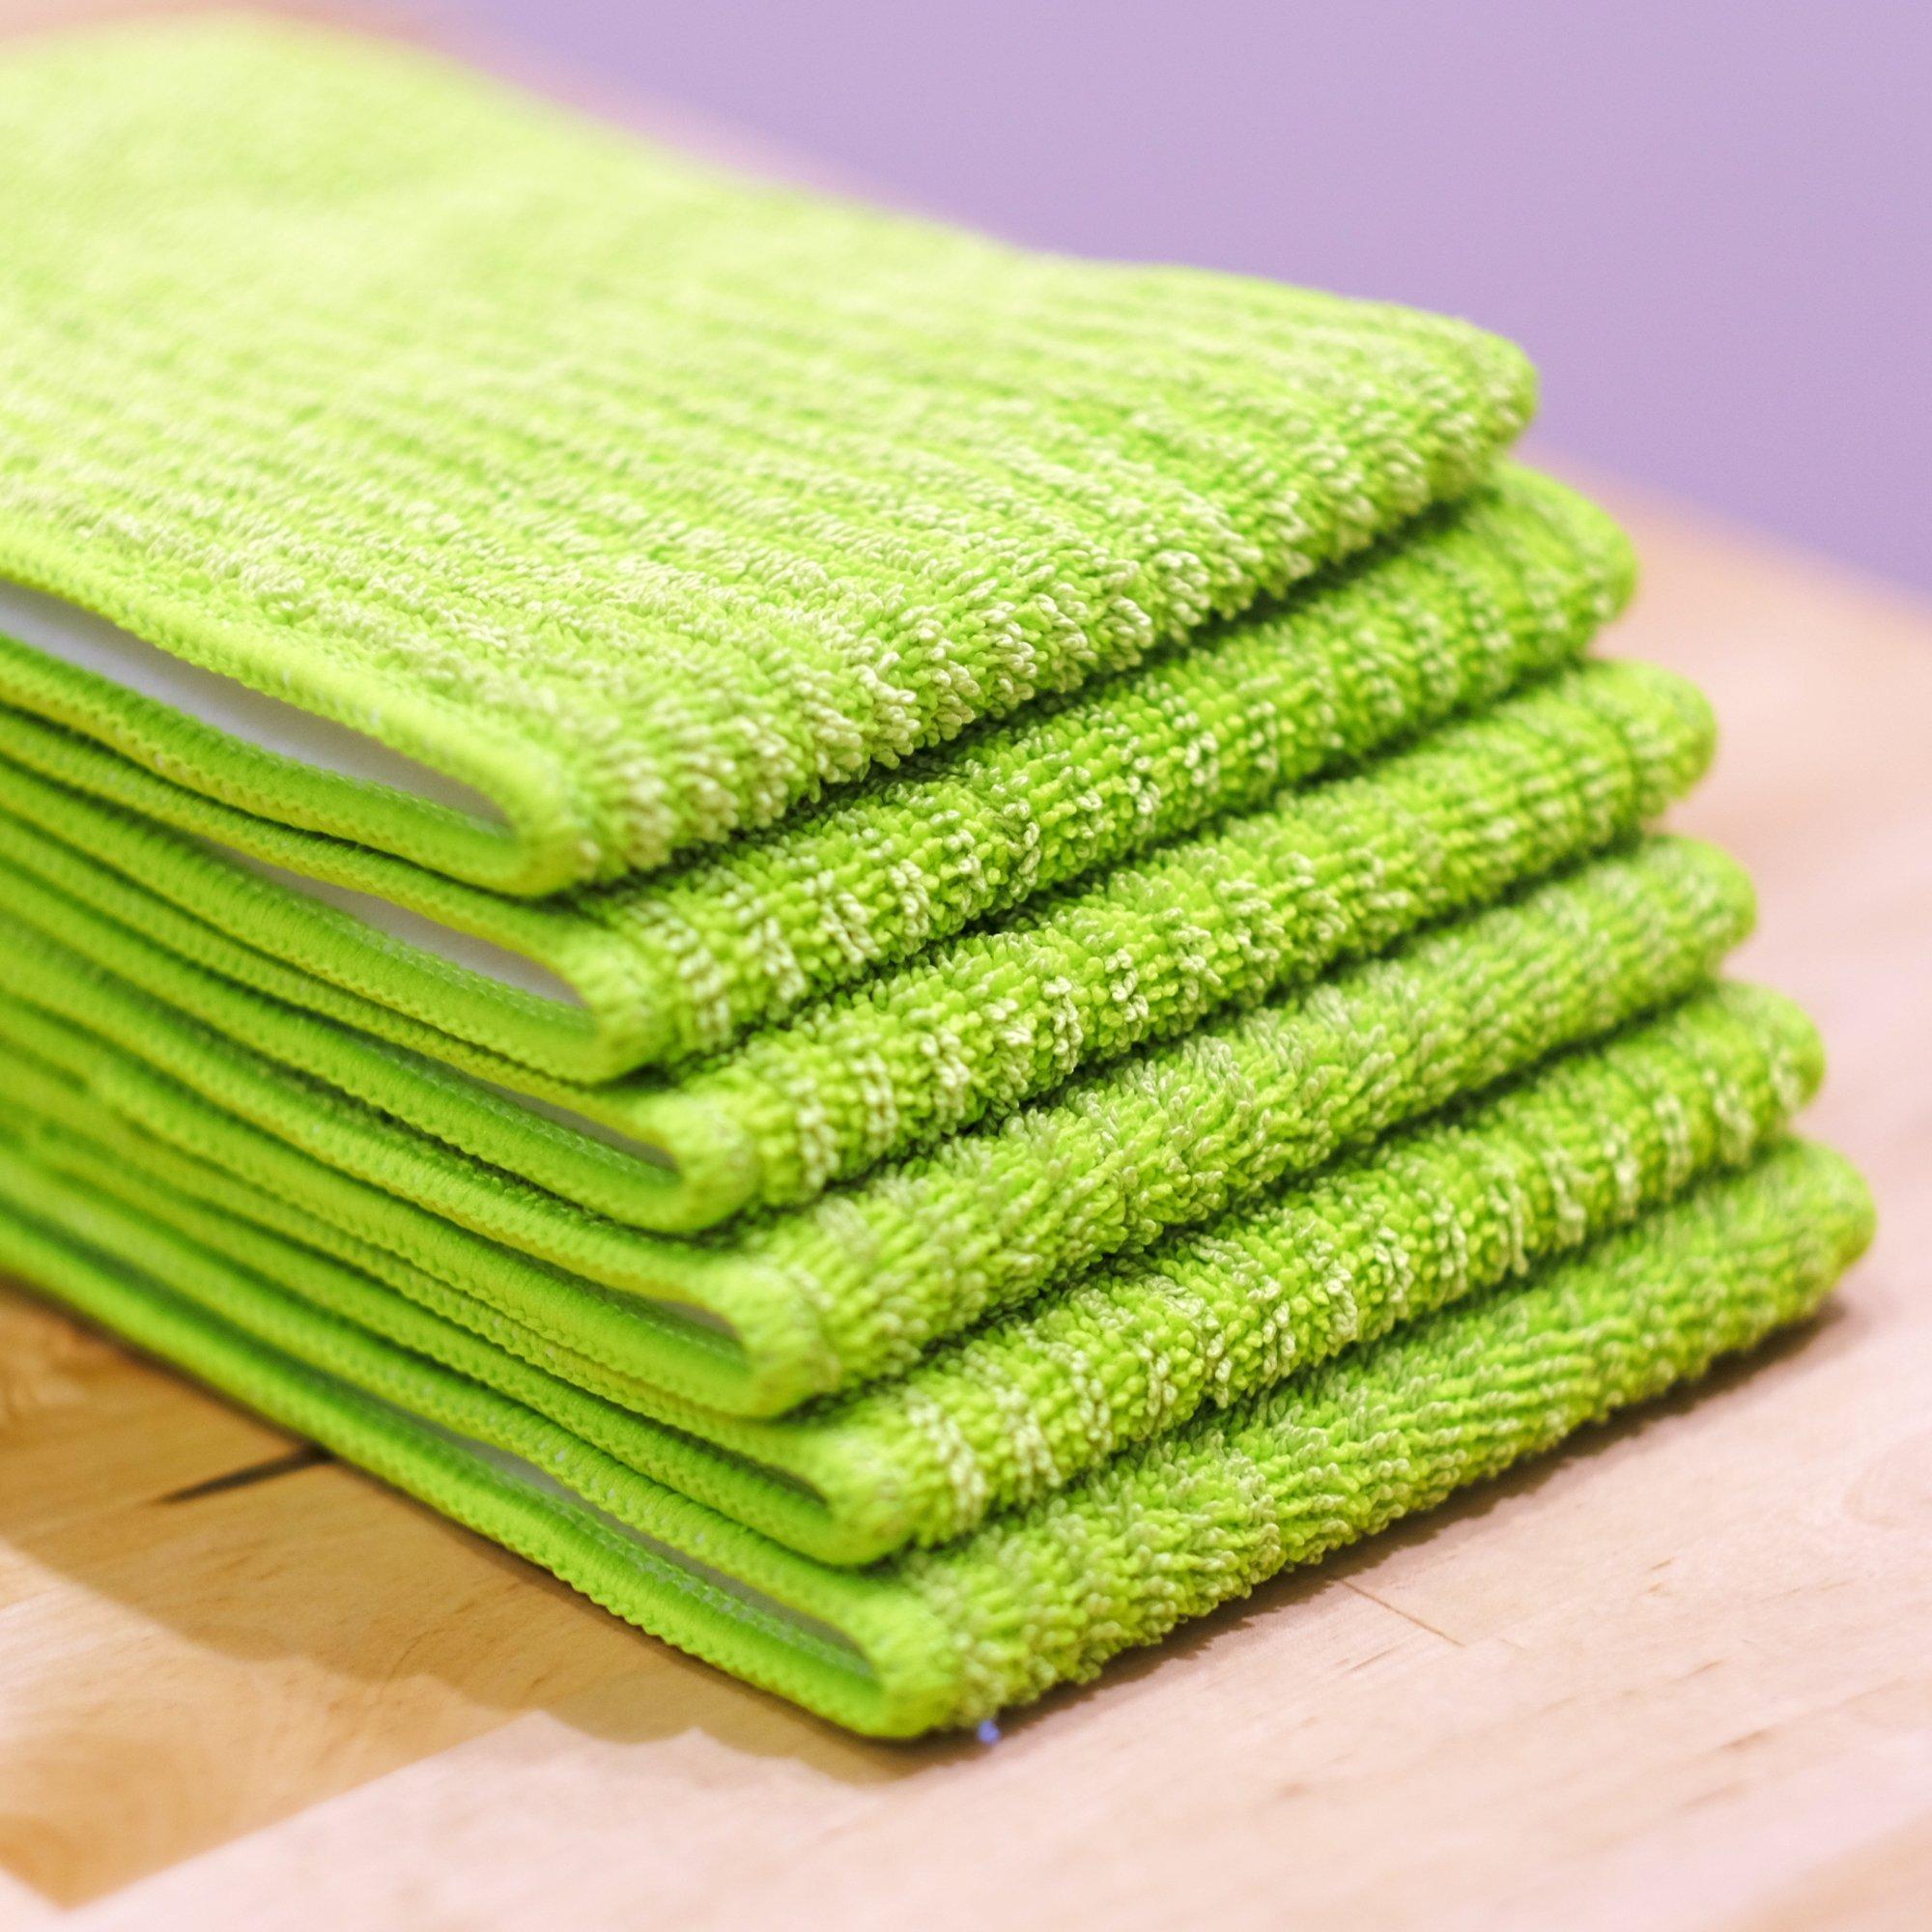 Microfiber Mop 18inch Velcro Wet & Dry Mop Refill for Hardwood Floors Set of 8 by Bear Family by Bear Family Microfiber (Image #8)